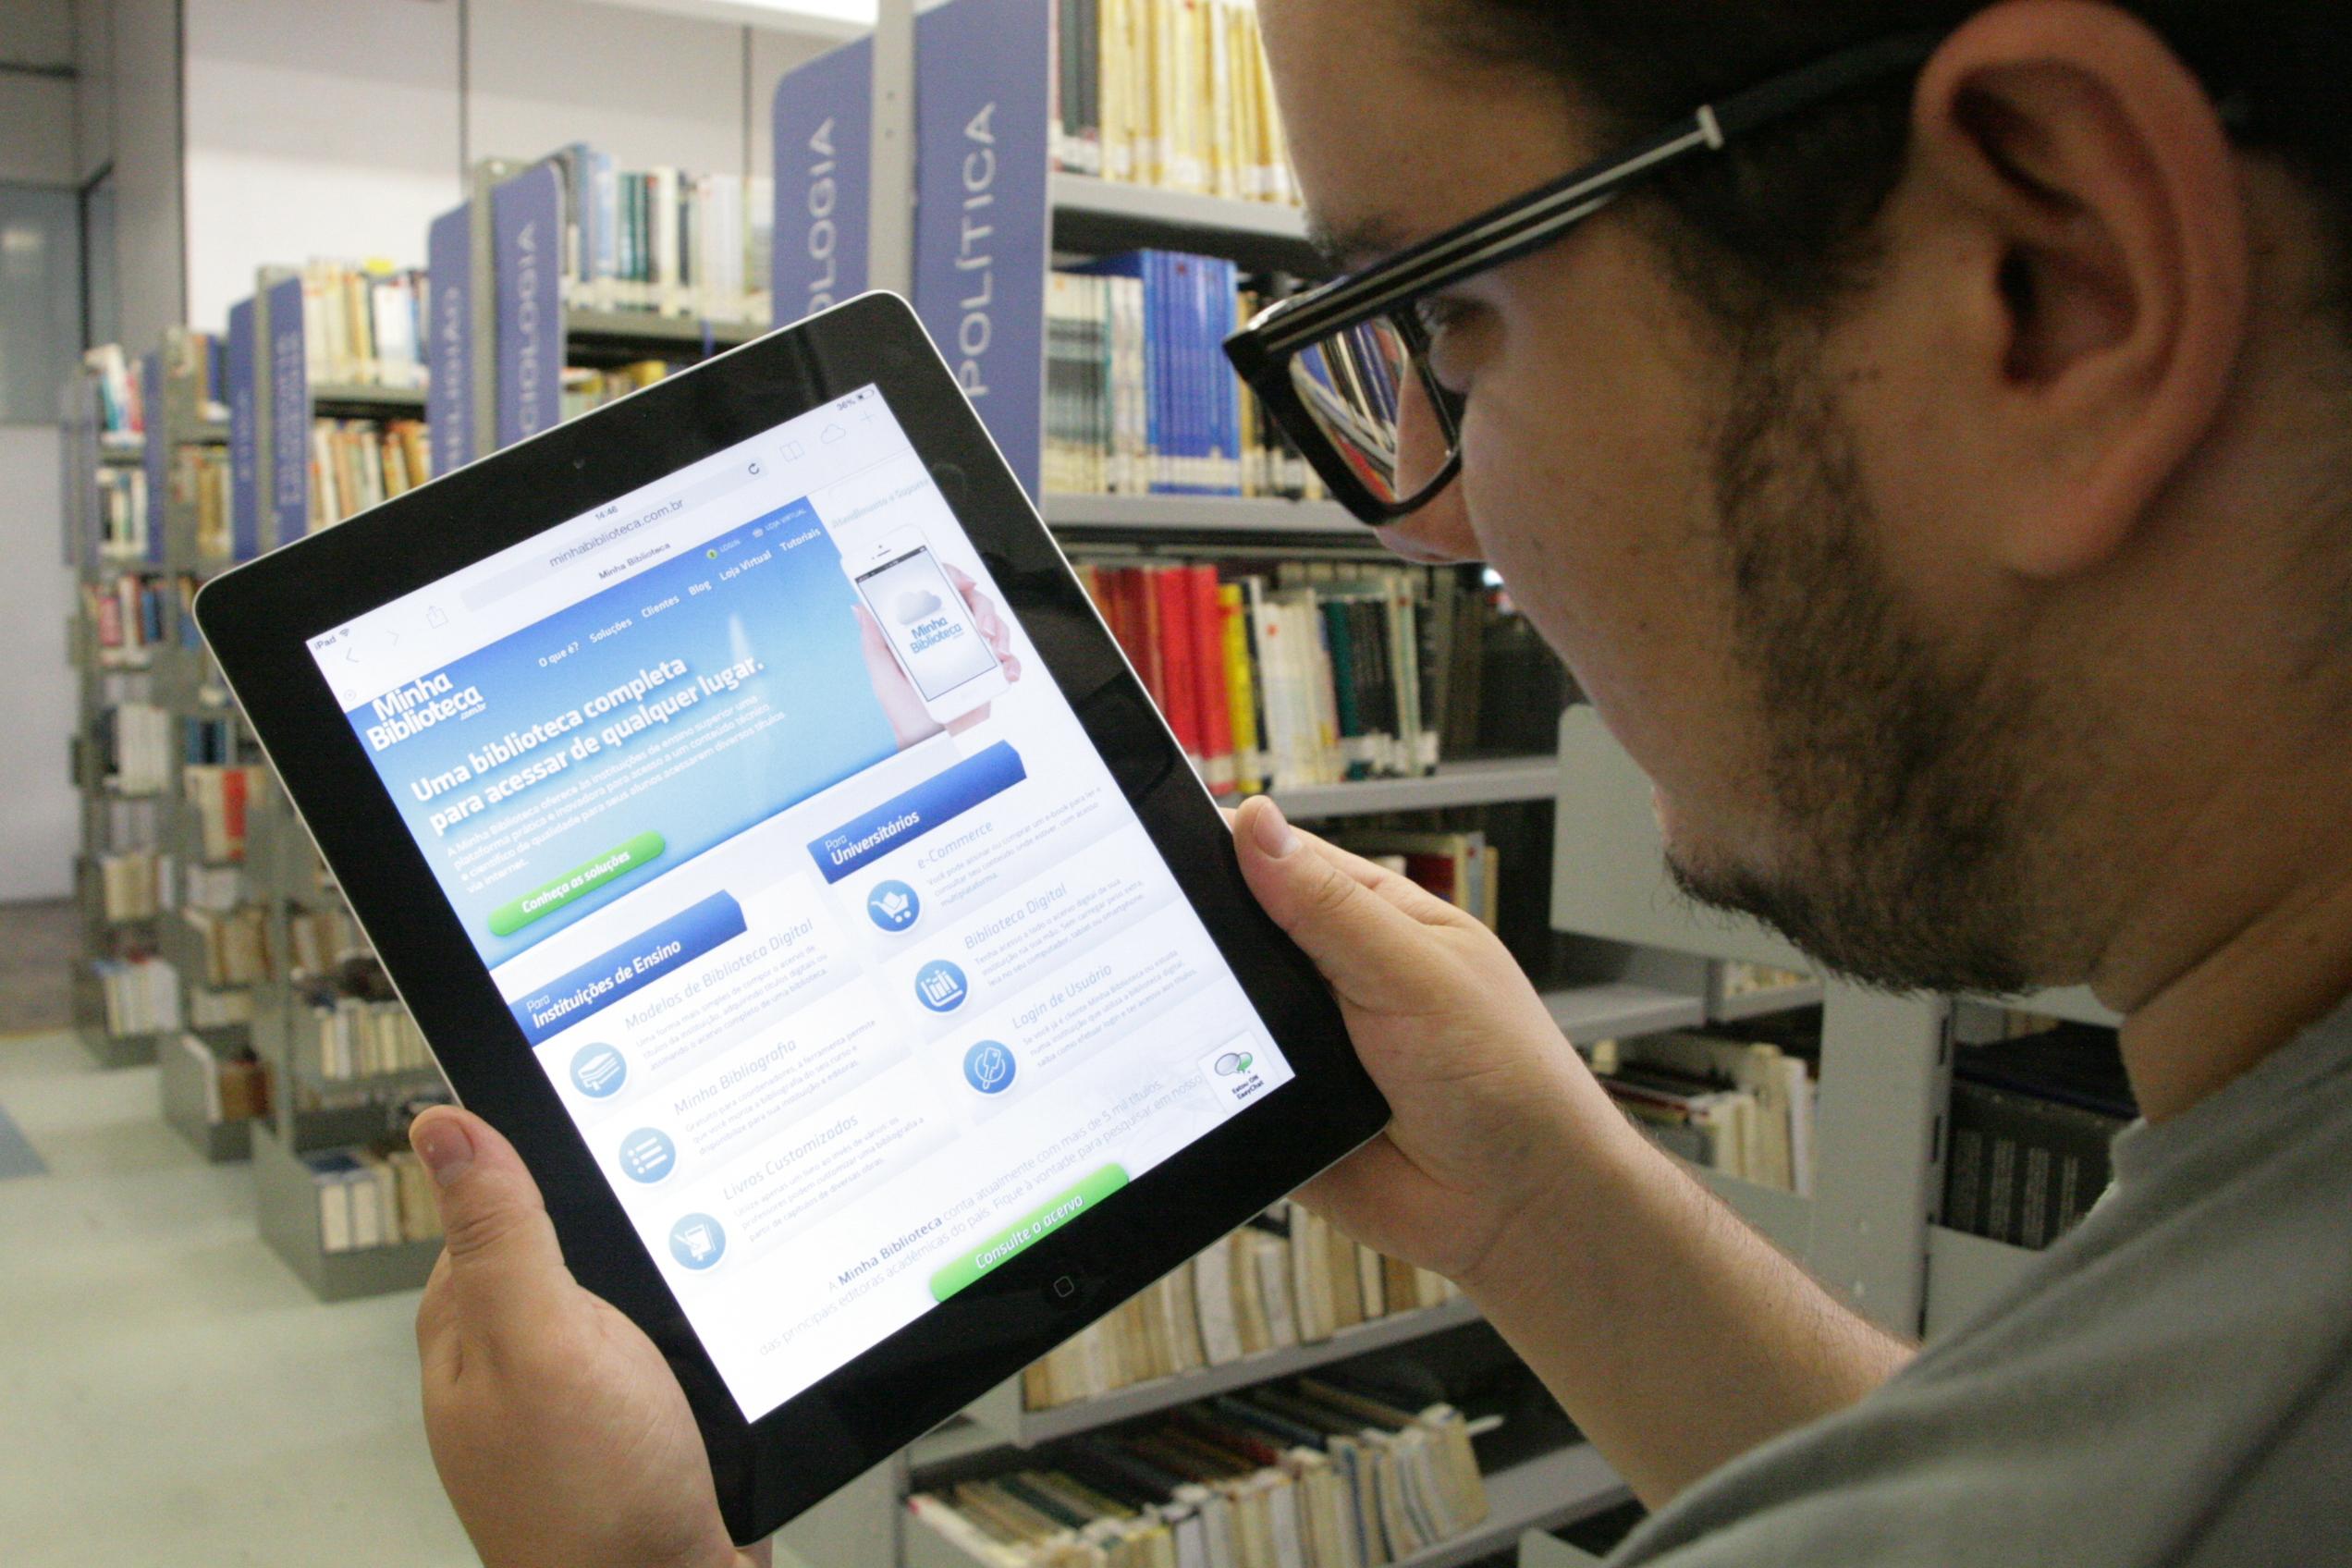 Aluno acessando biblioteca virtual da UCPel